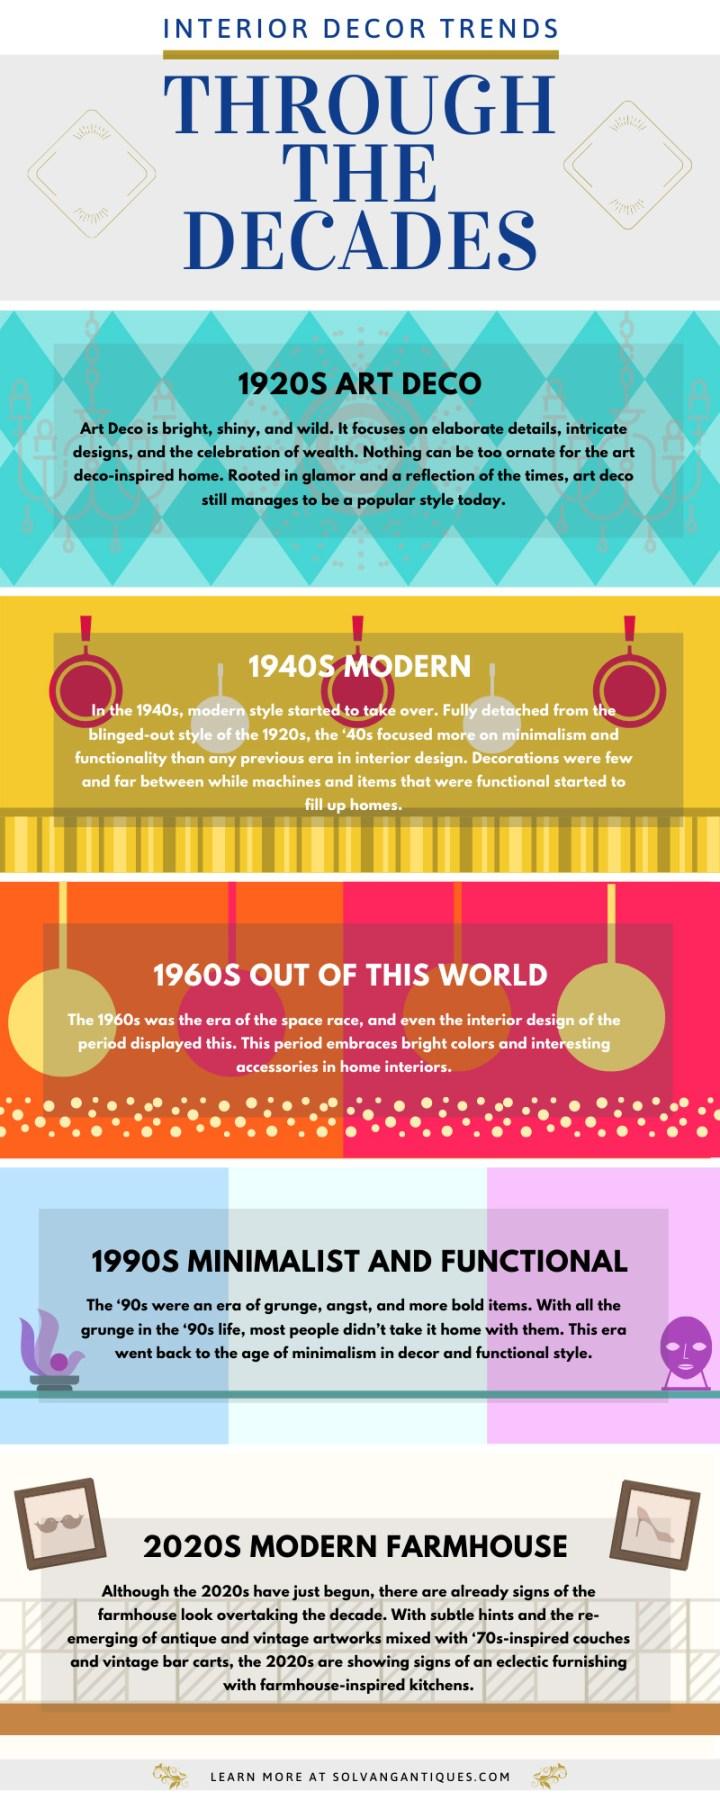 Interior Decor Trends Through the Decades